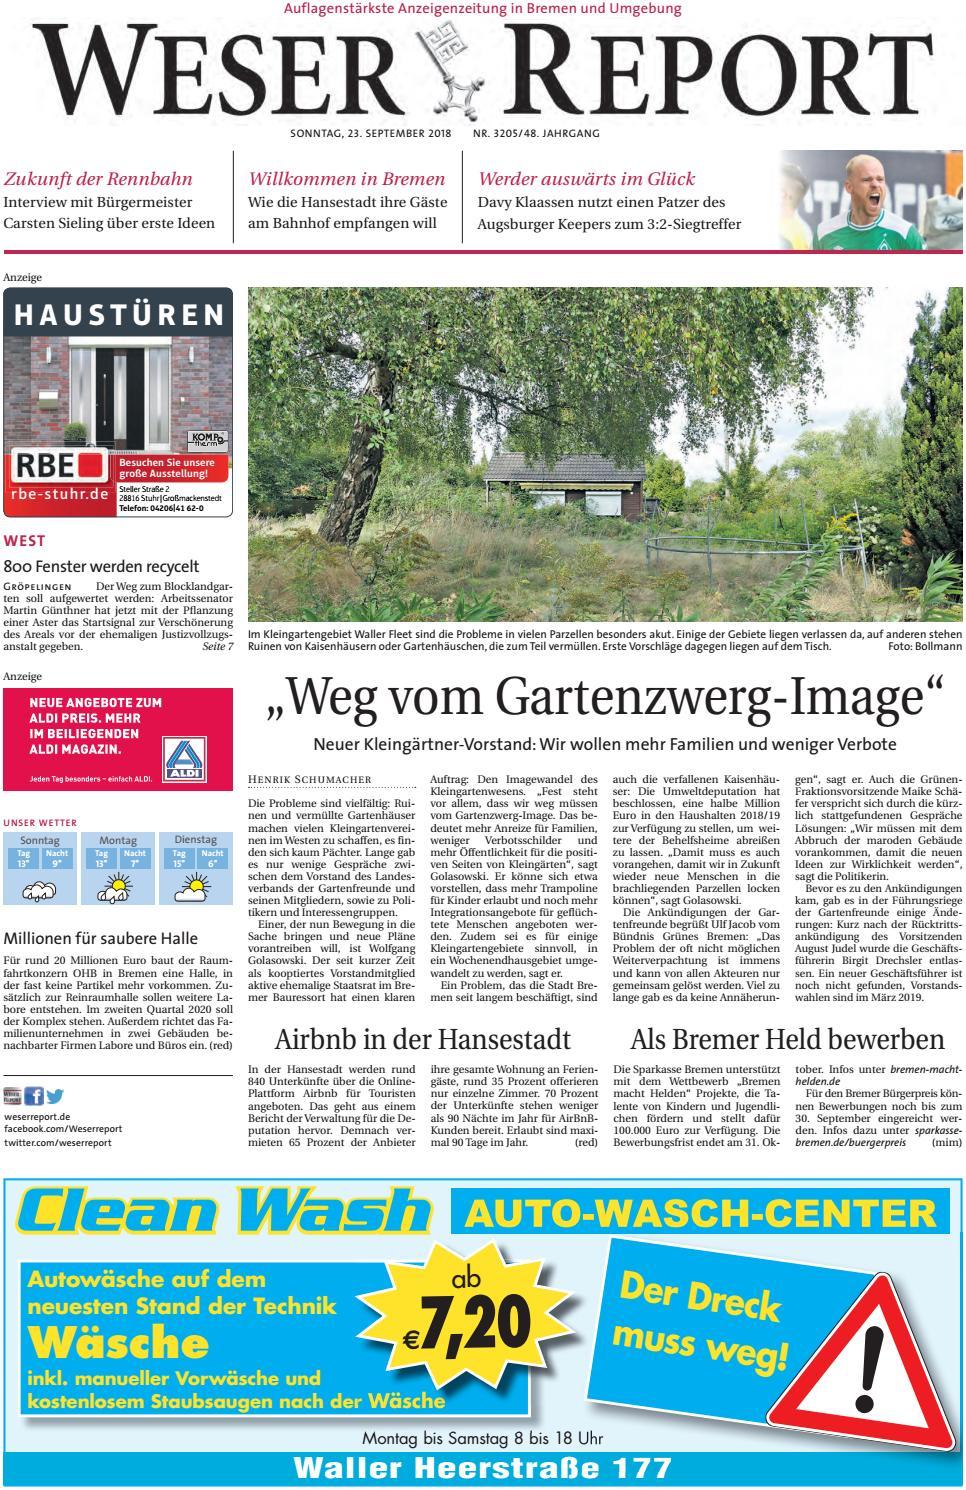 Weser Report - West vom 23.09.2018 by KPS Verlagsgesellschaft mbH ...